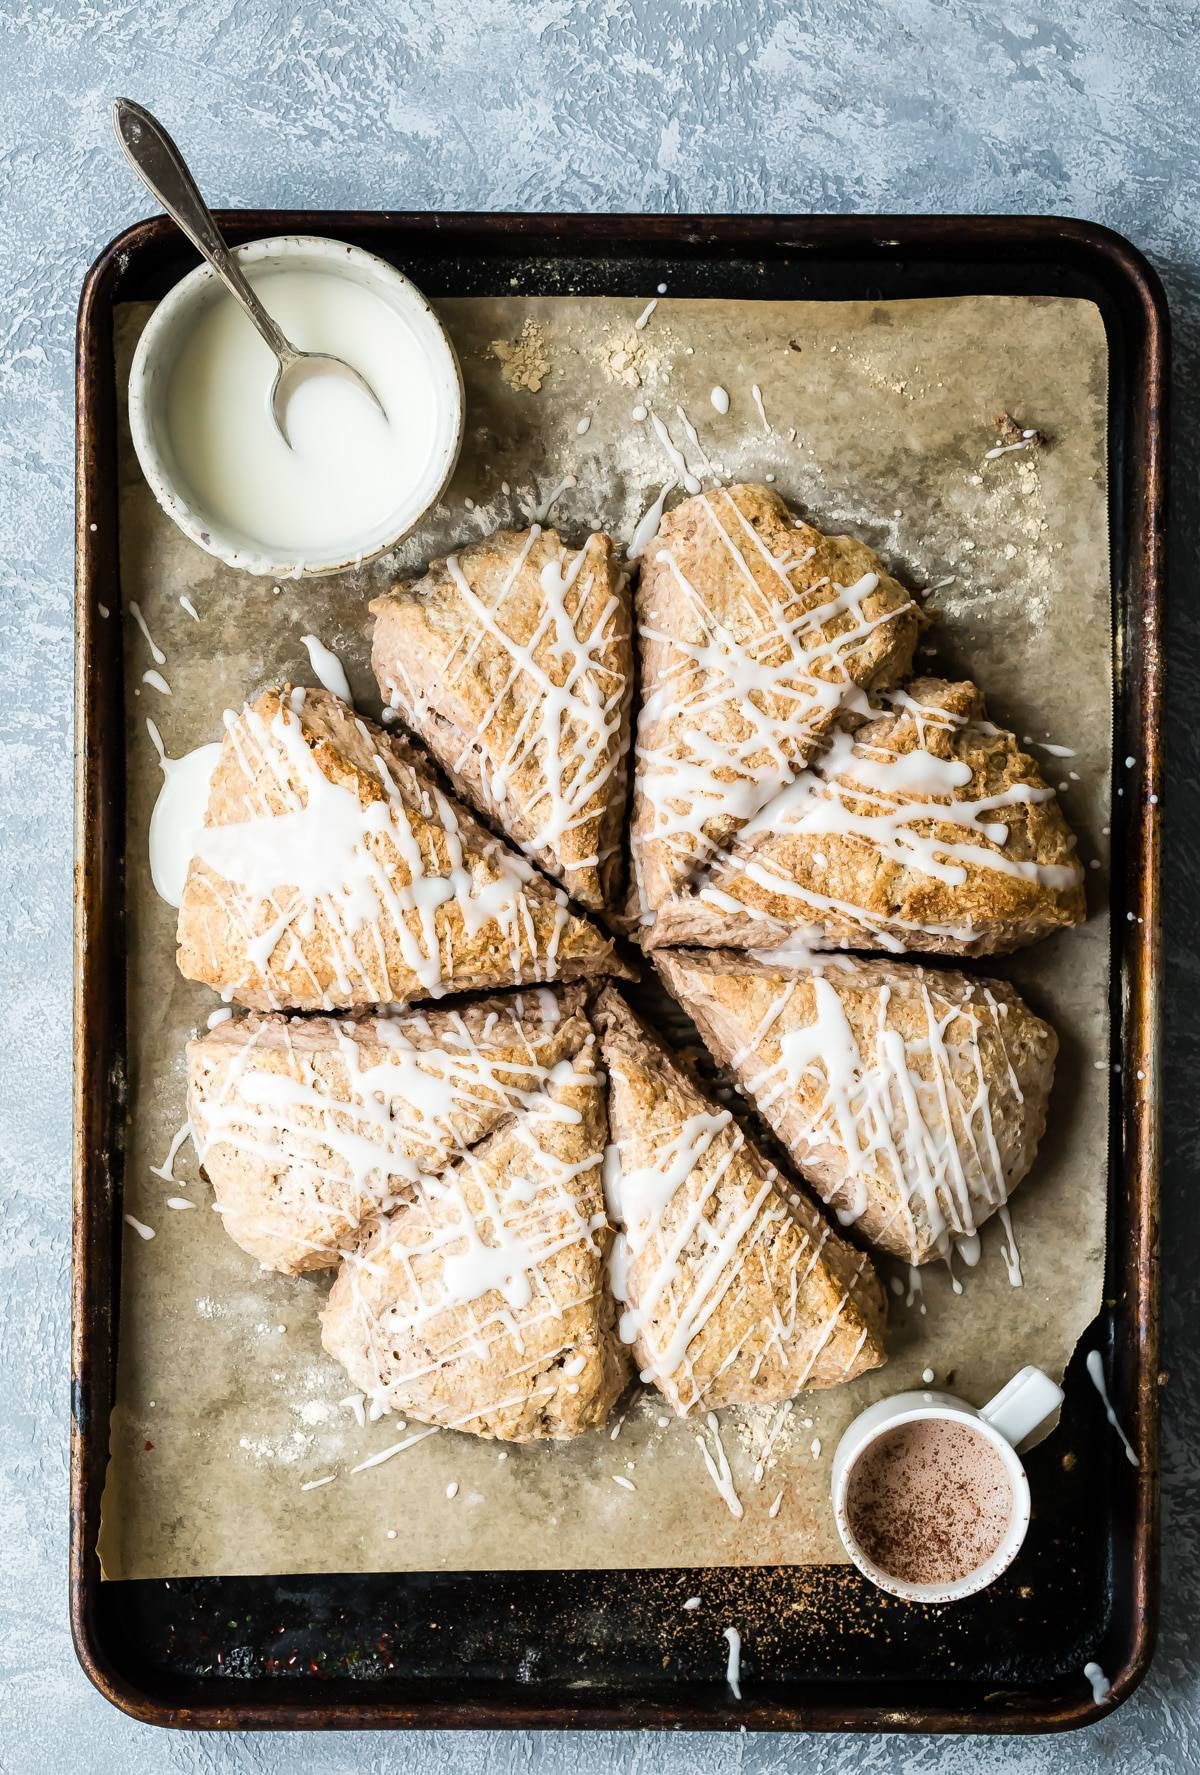 Buttermilk Scones on a baking sheet pan